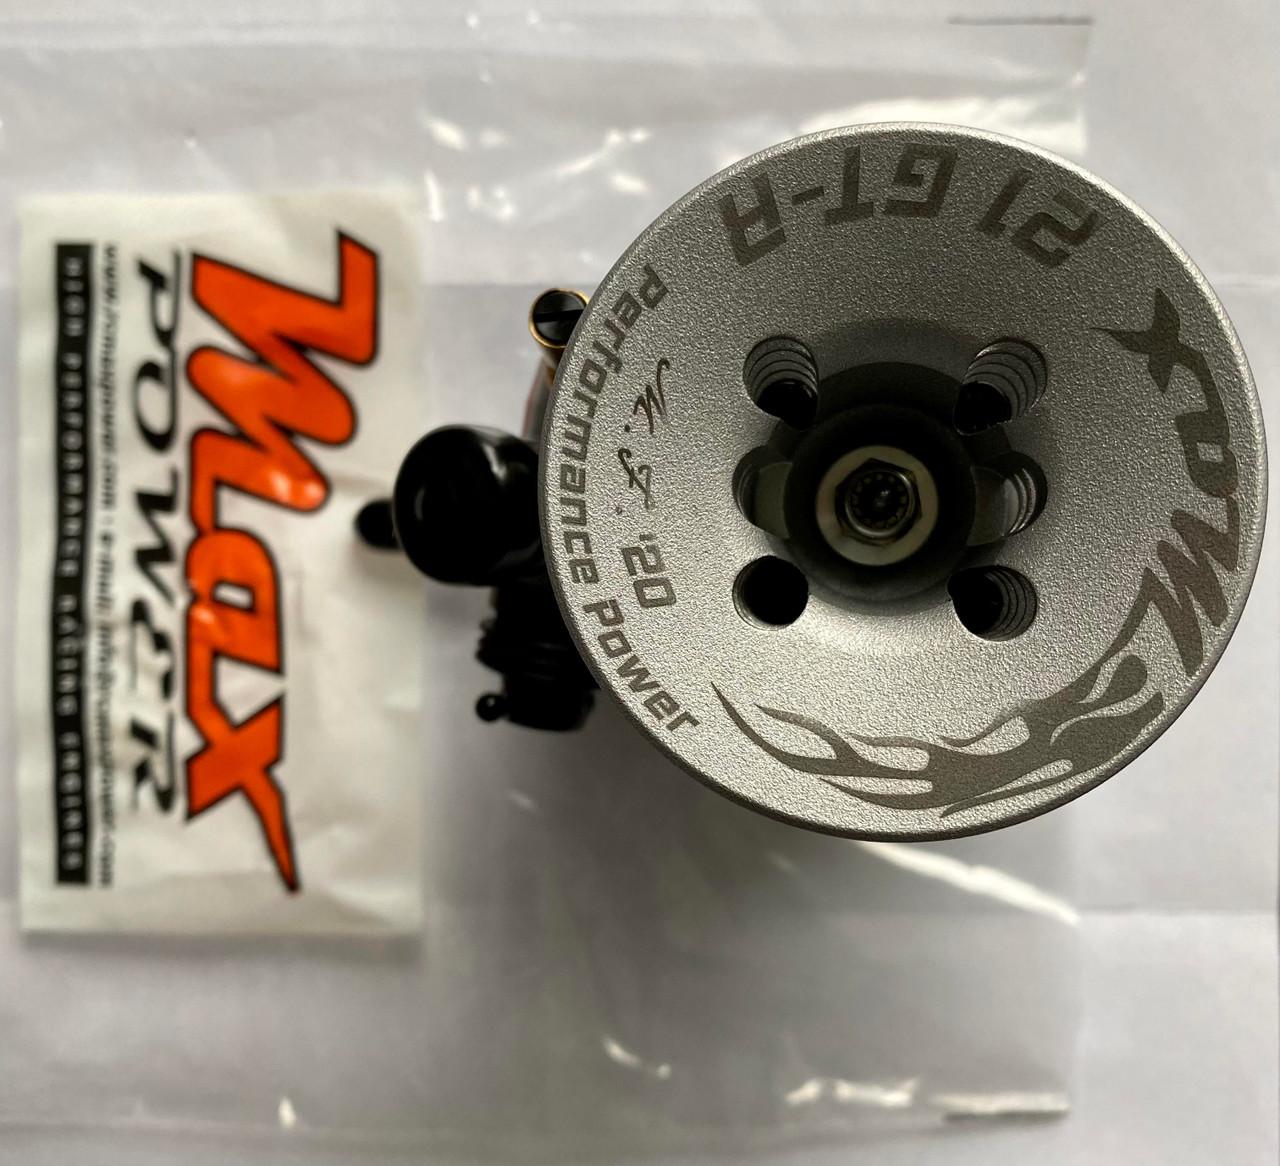 MX-21-MAX-GT-R - .21 Max Power GT Engine